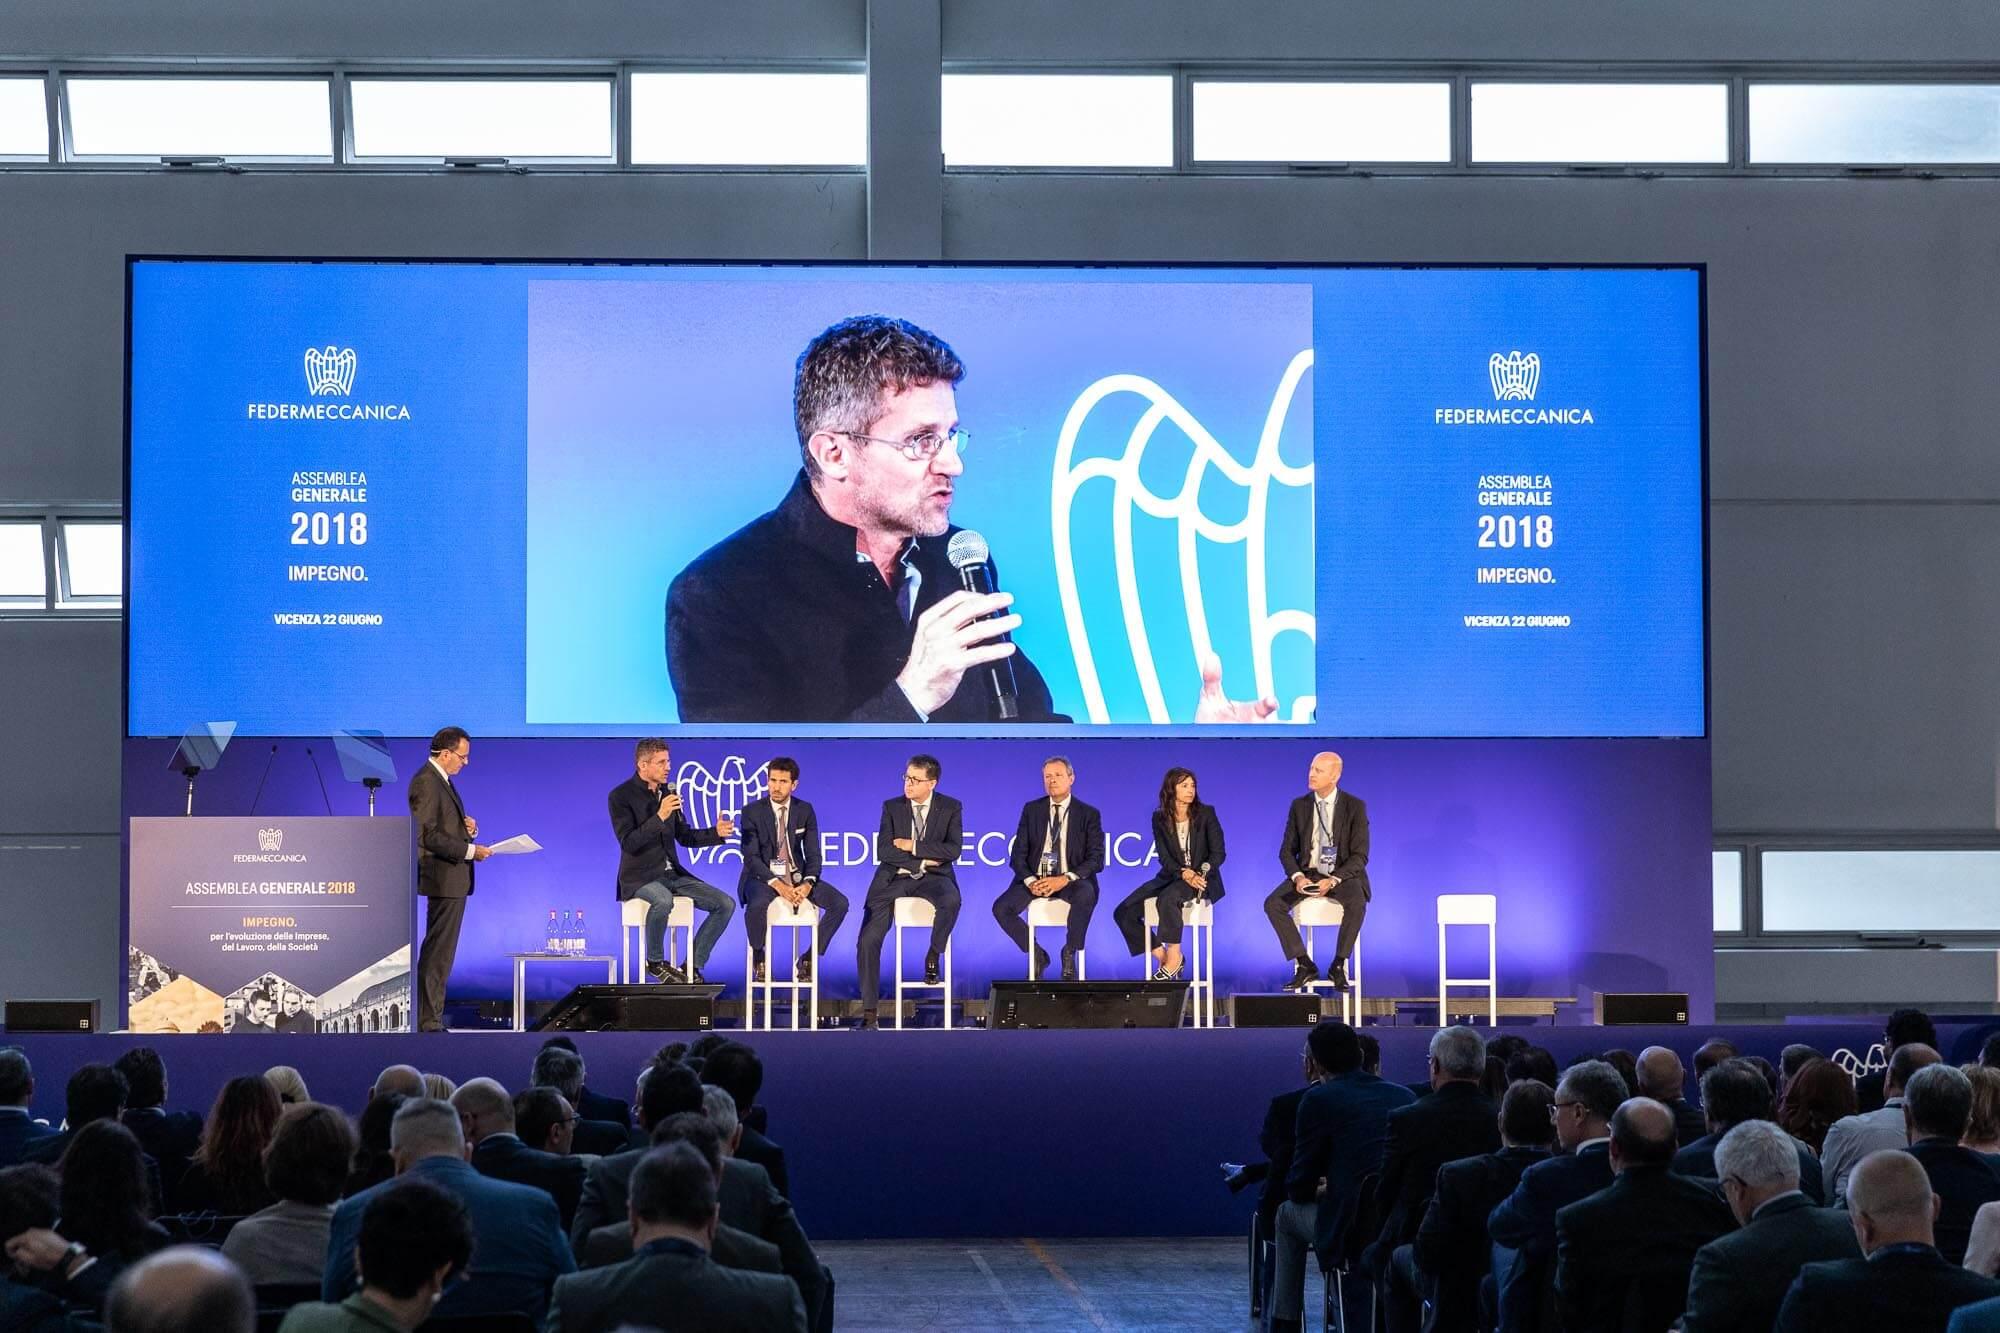 Assemblea generale 2018 Federmeccanica - evento on stage